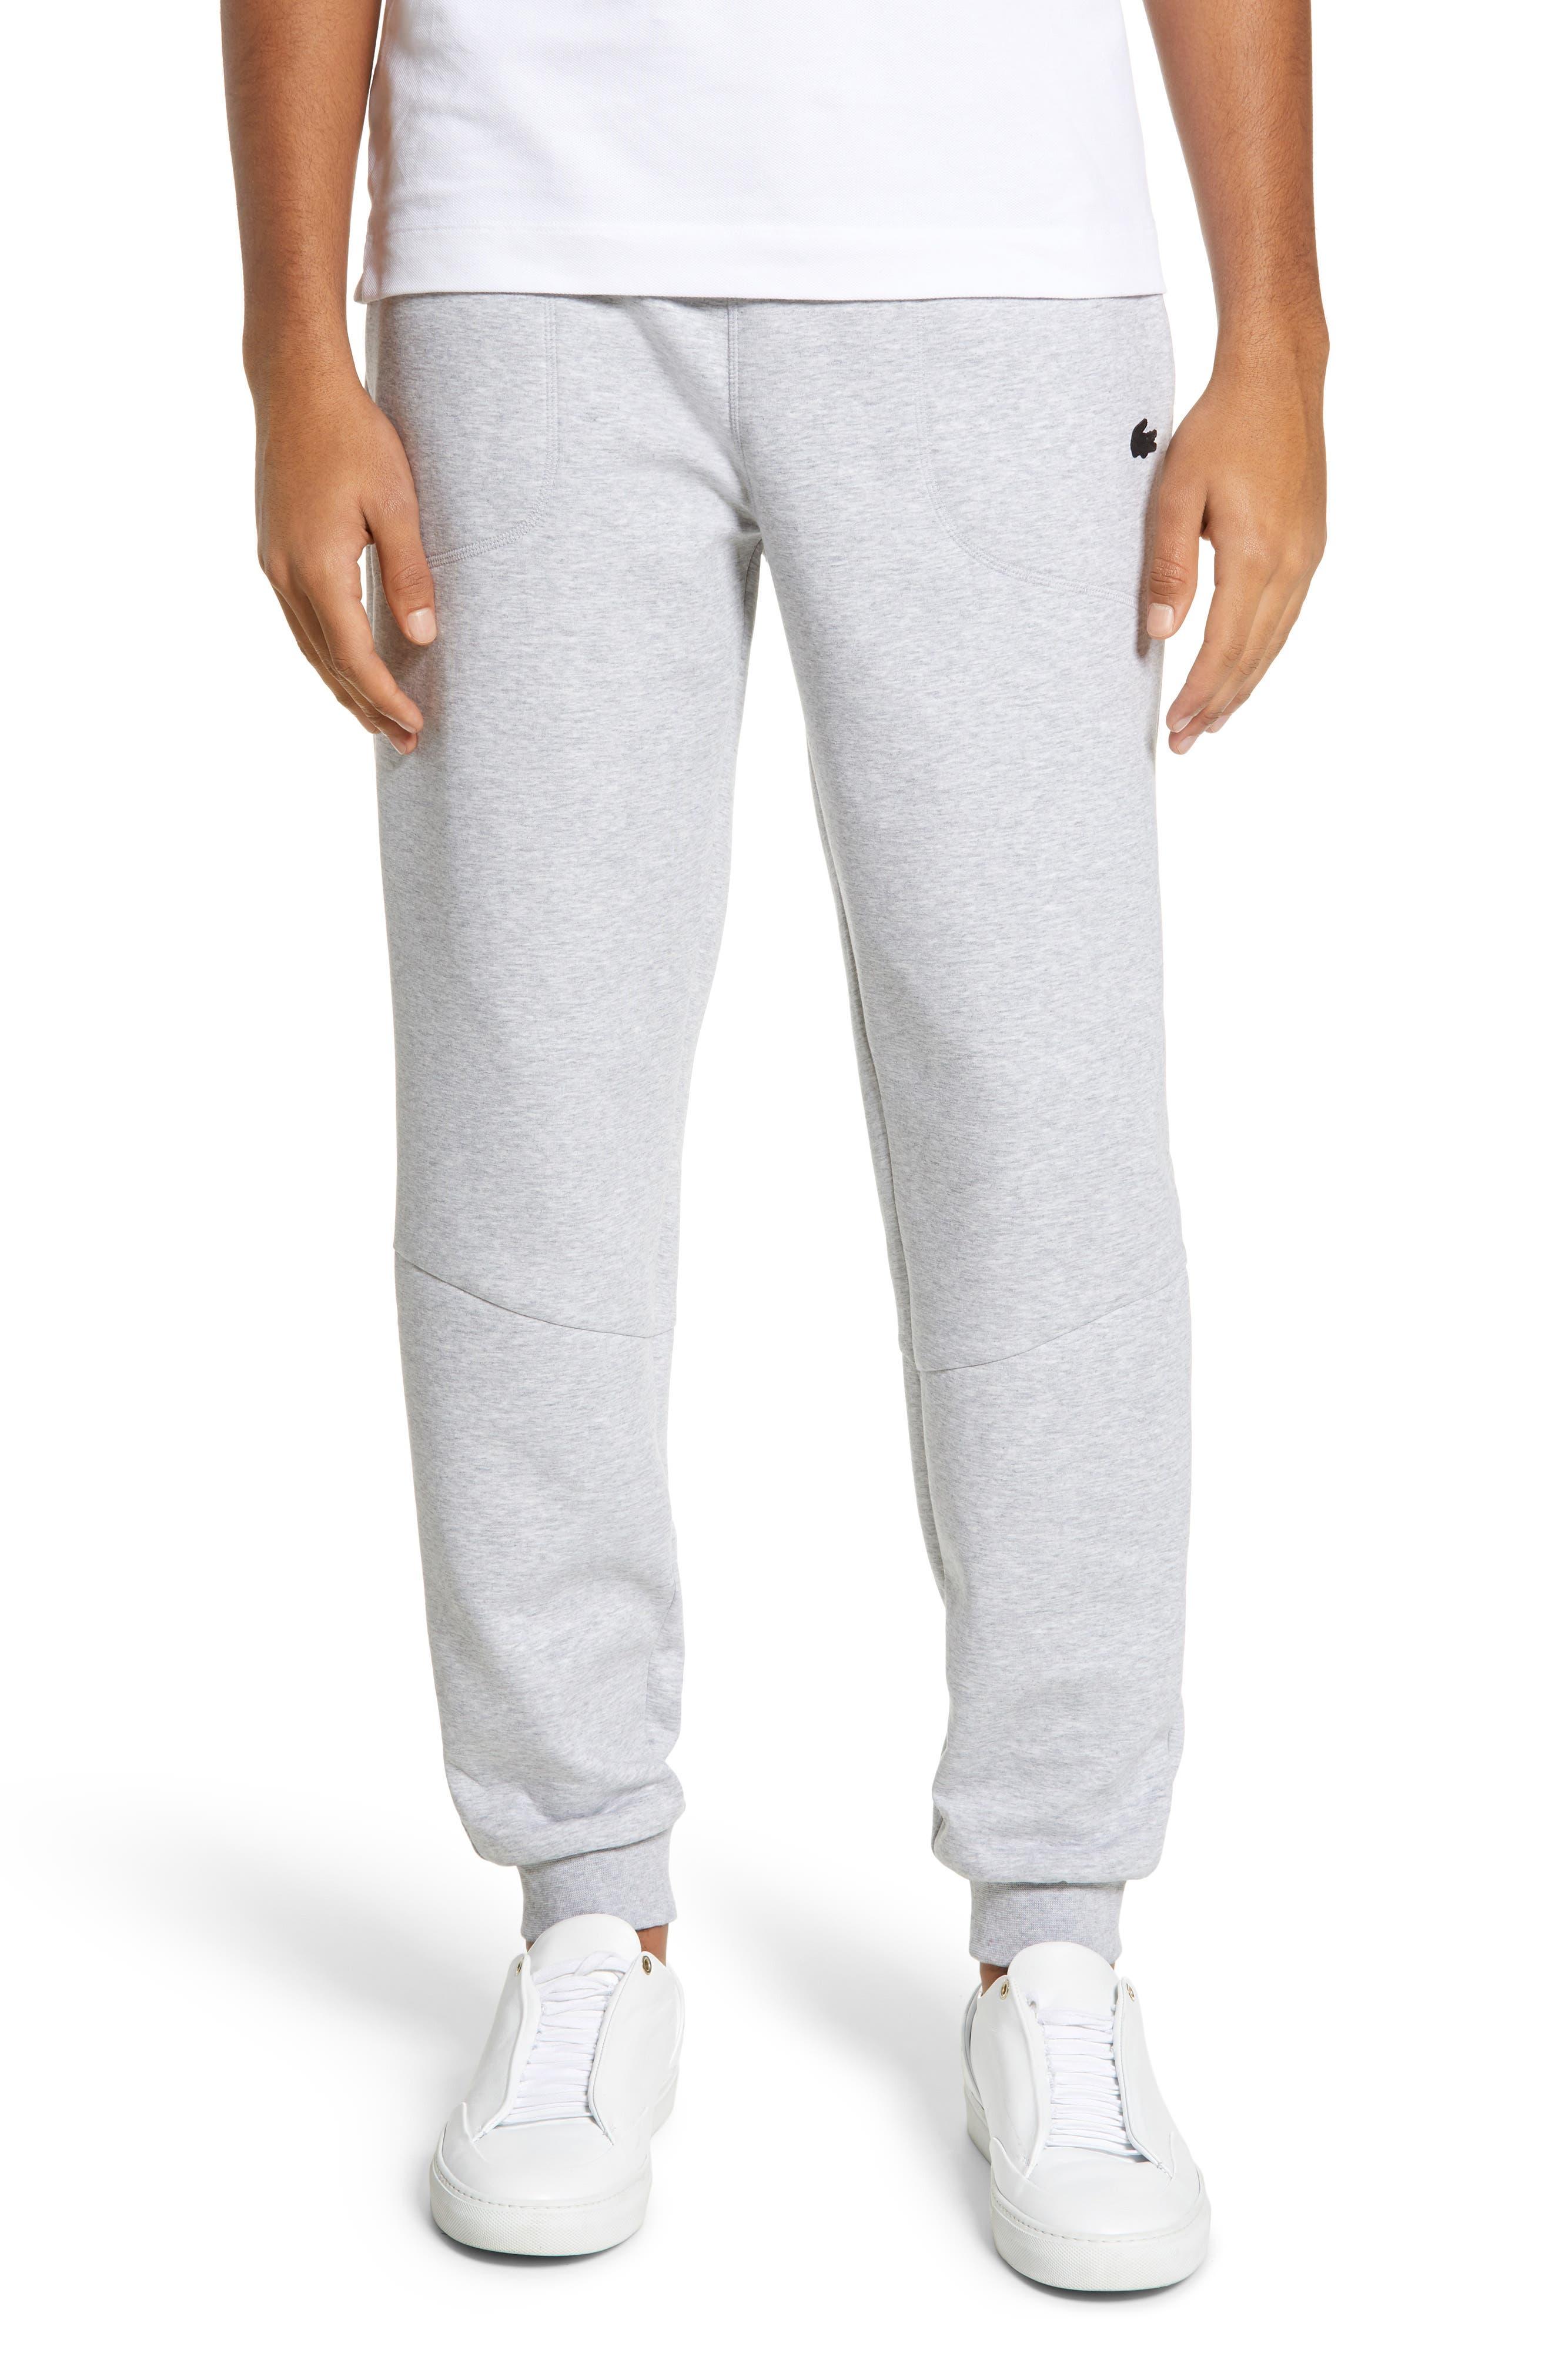 Lacoste Motion Relaxed Fit Fleece Sweatpants, Metallic